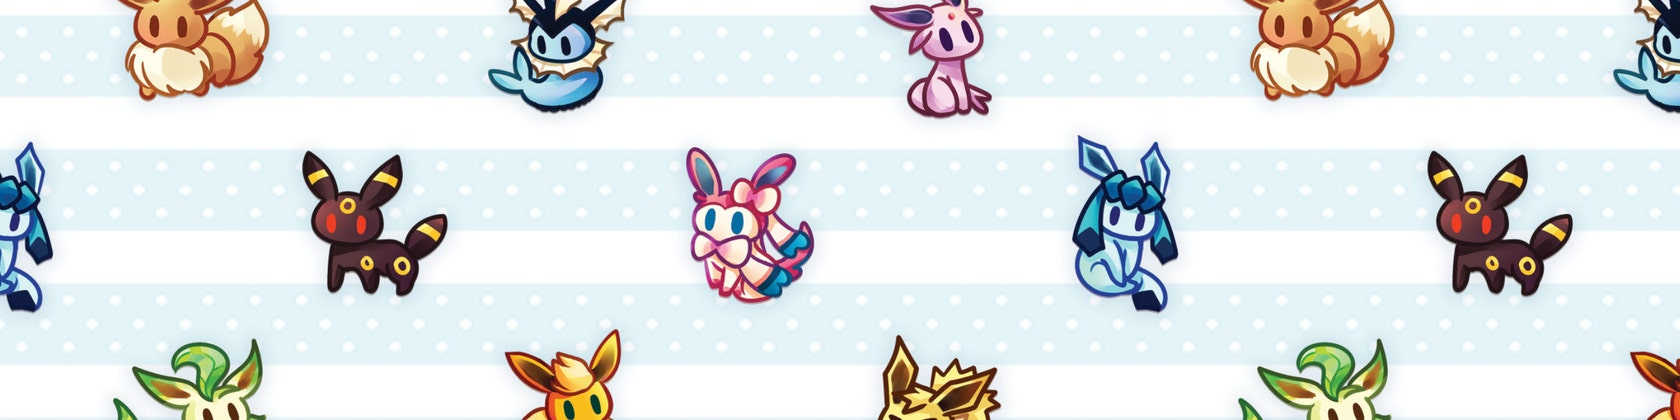 Mushimoo kawaii anime merch charms stickers por heymushimoo